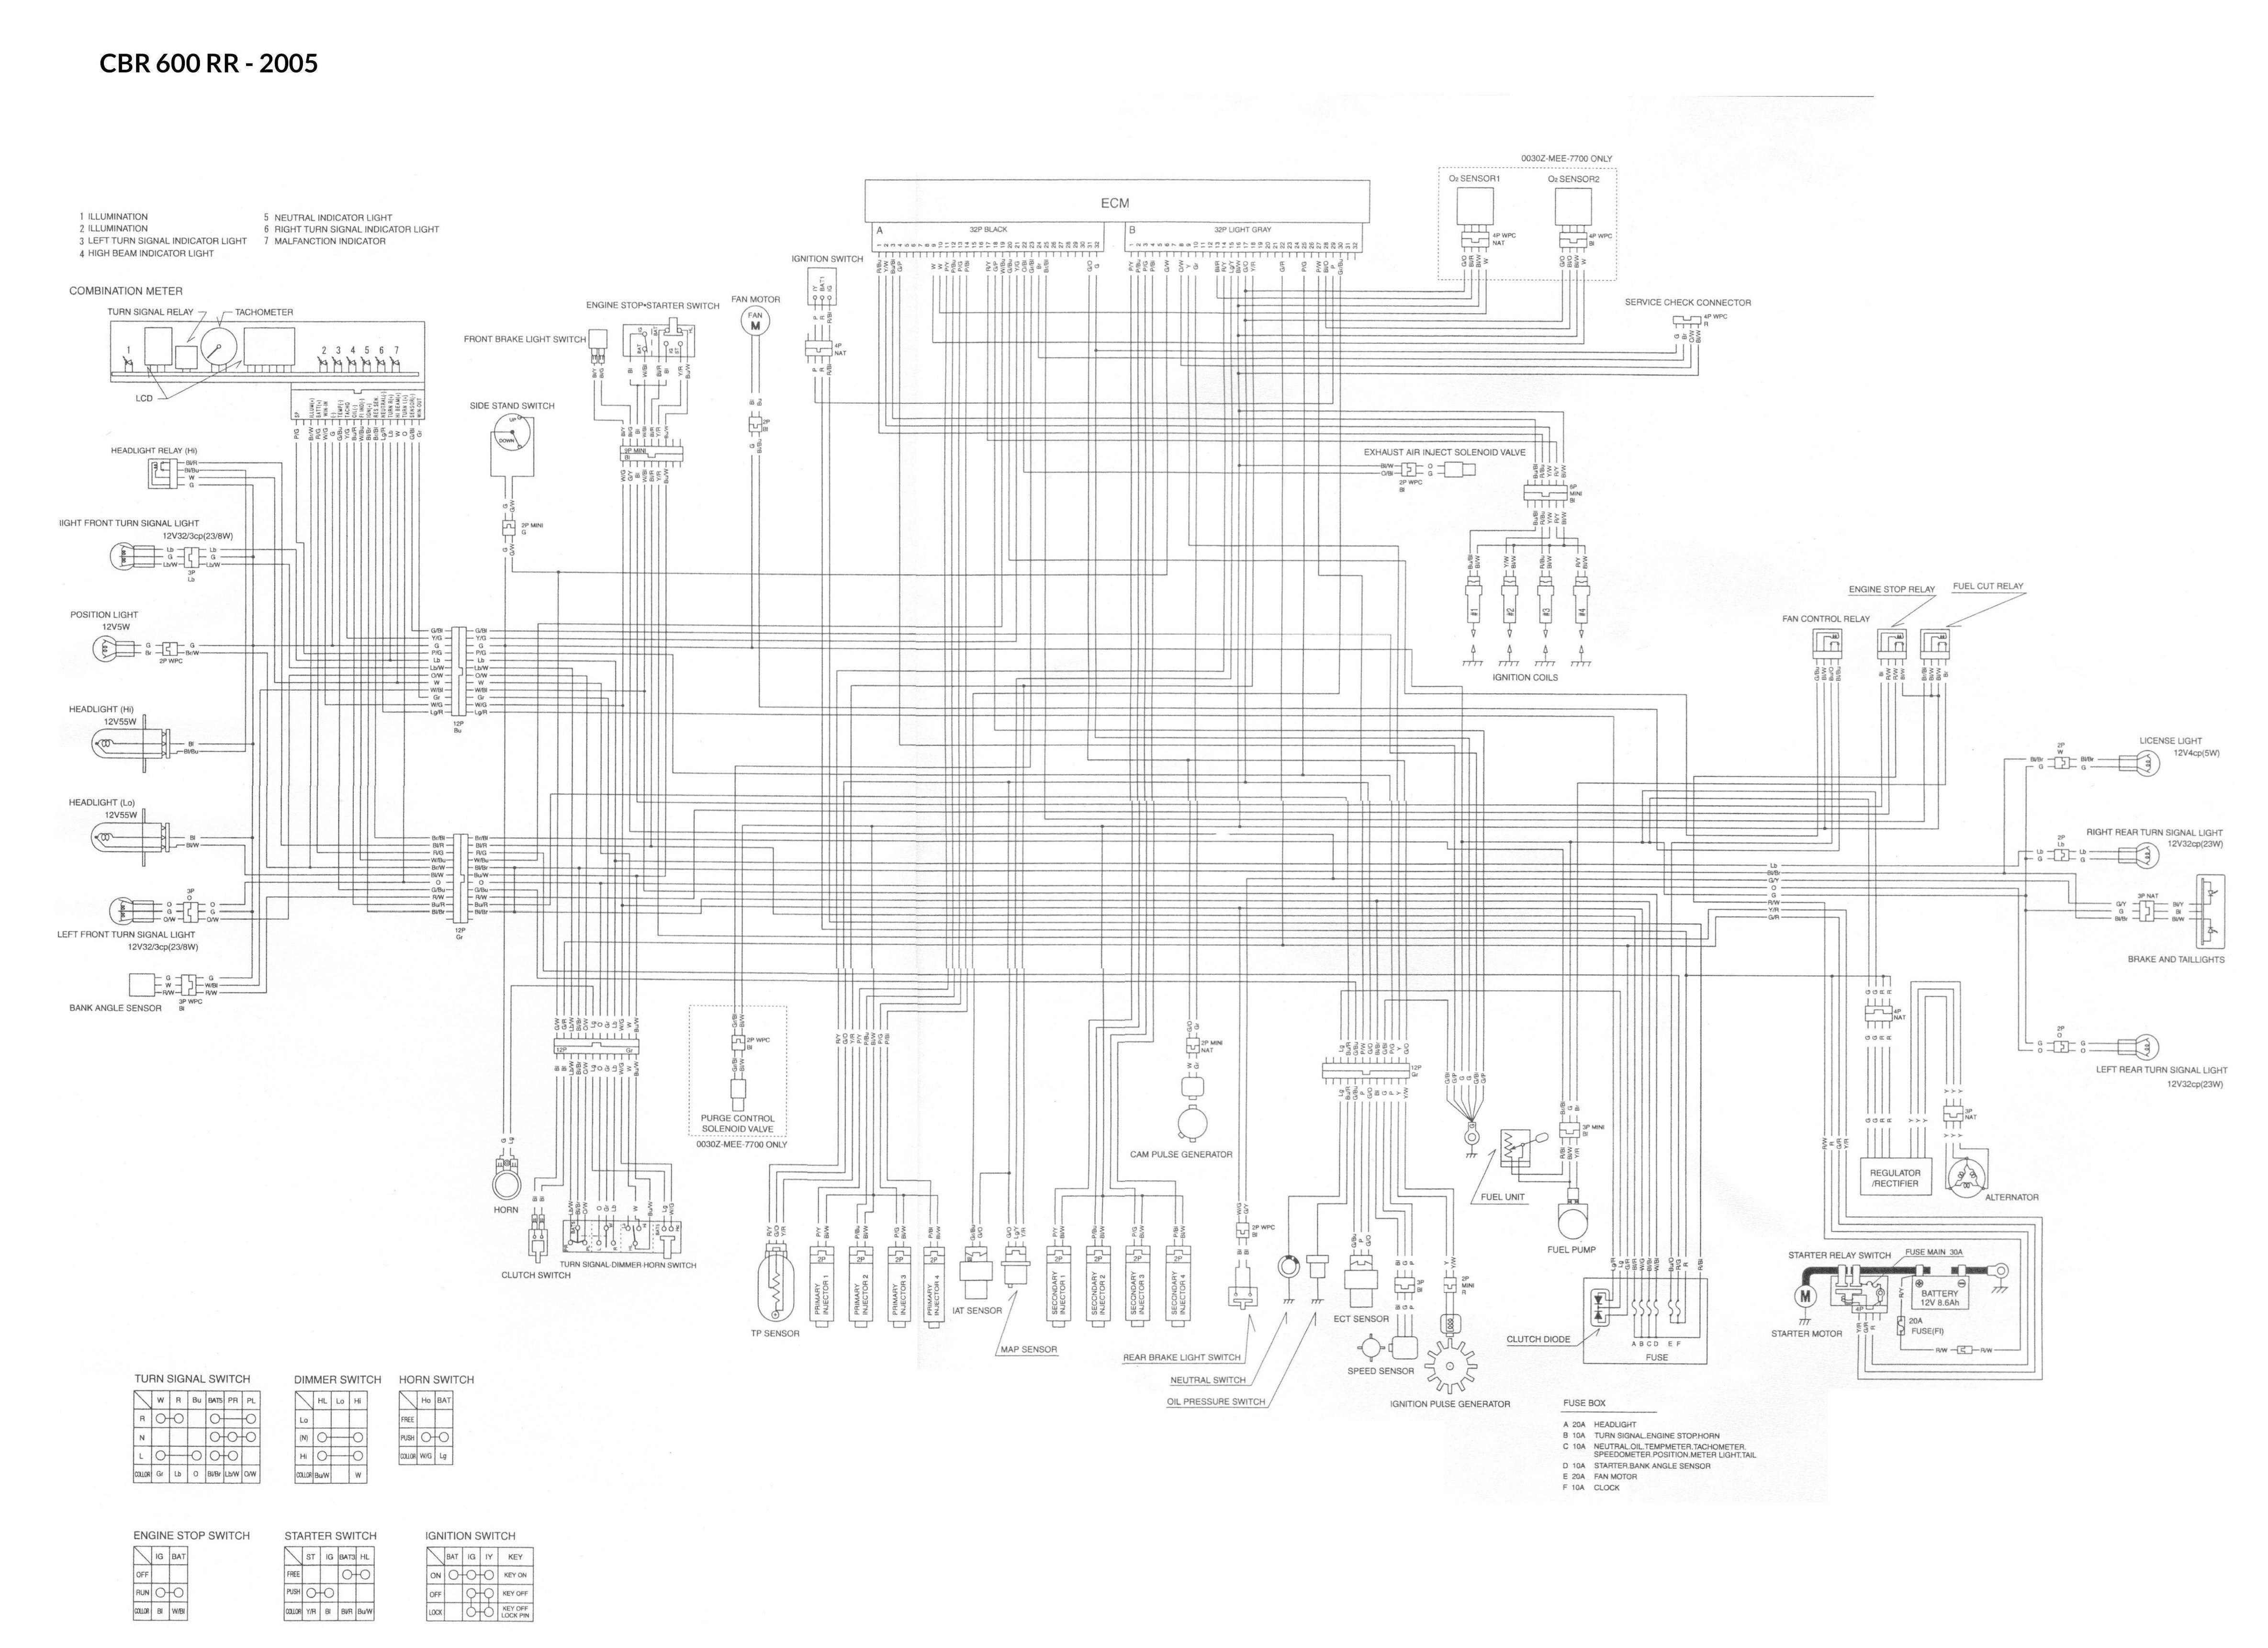 ZE_2261] 2005 Cbr 600 Rr Wiring Diagram For Display Wiring DiagramWww Mohammedshrine Librar Wiring 101